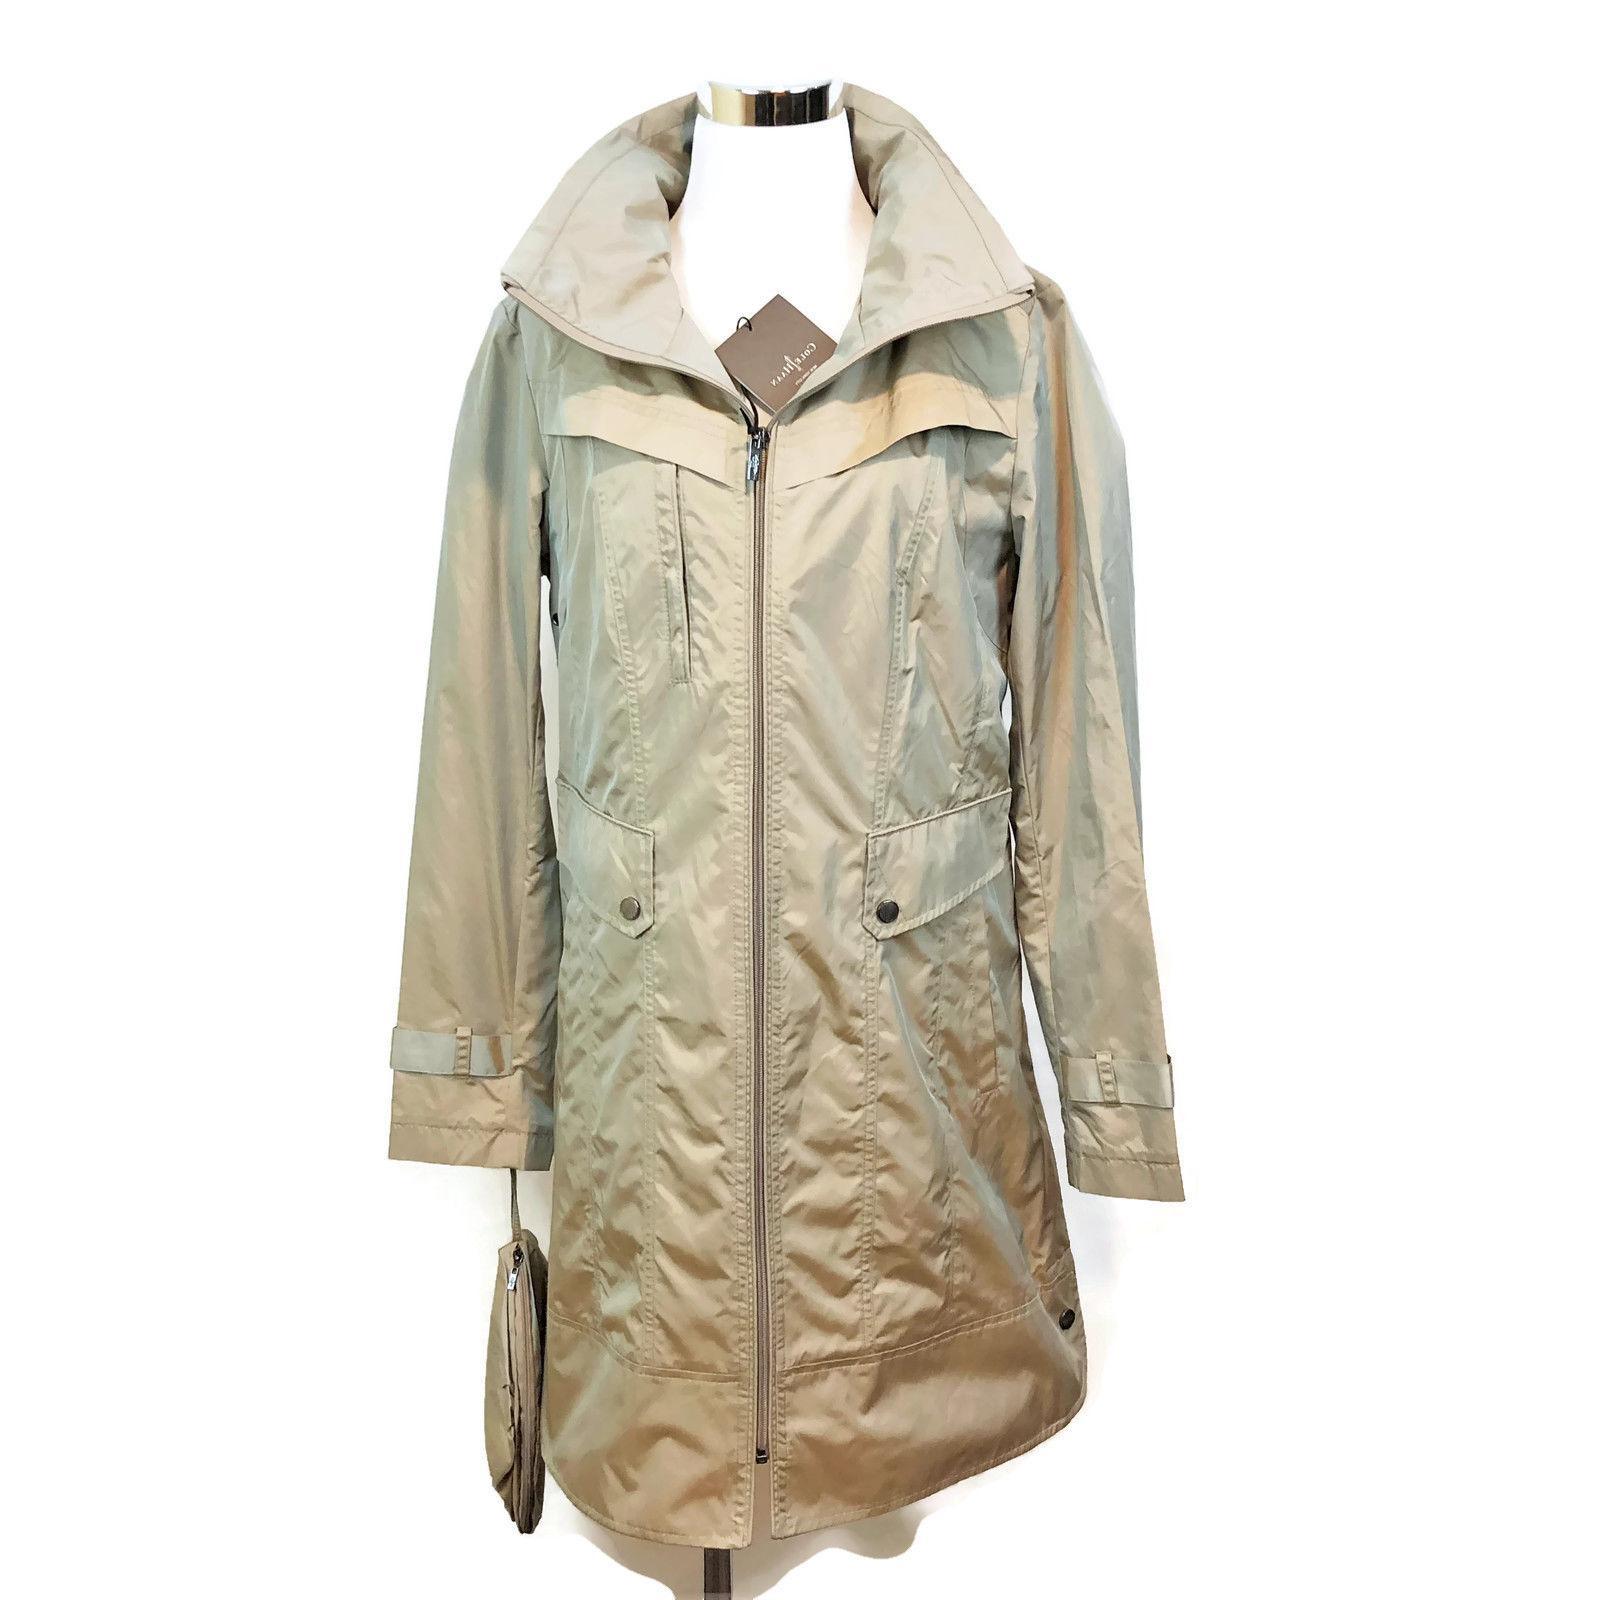 jacket trench rain coat packable travel bag